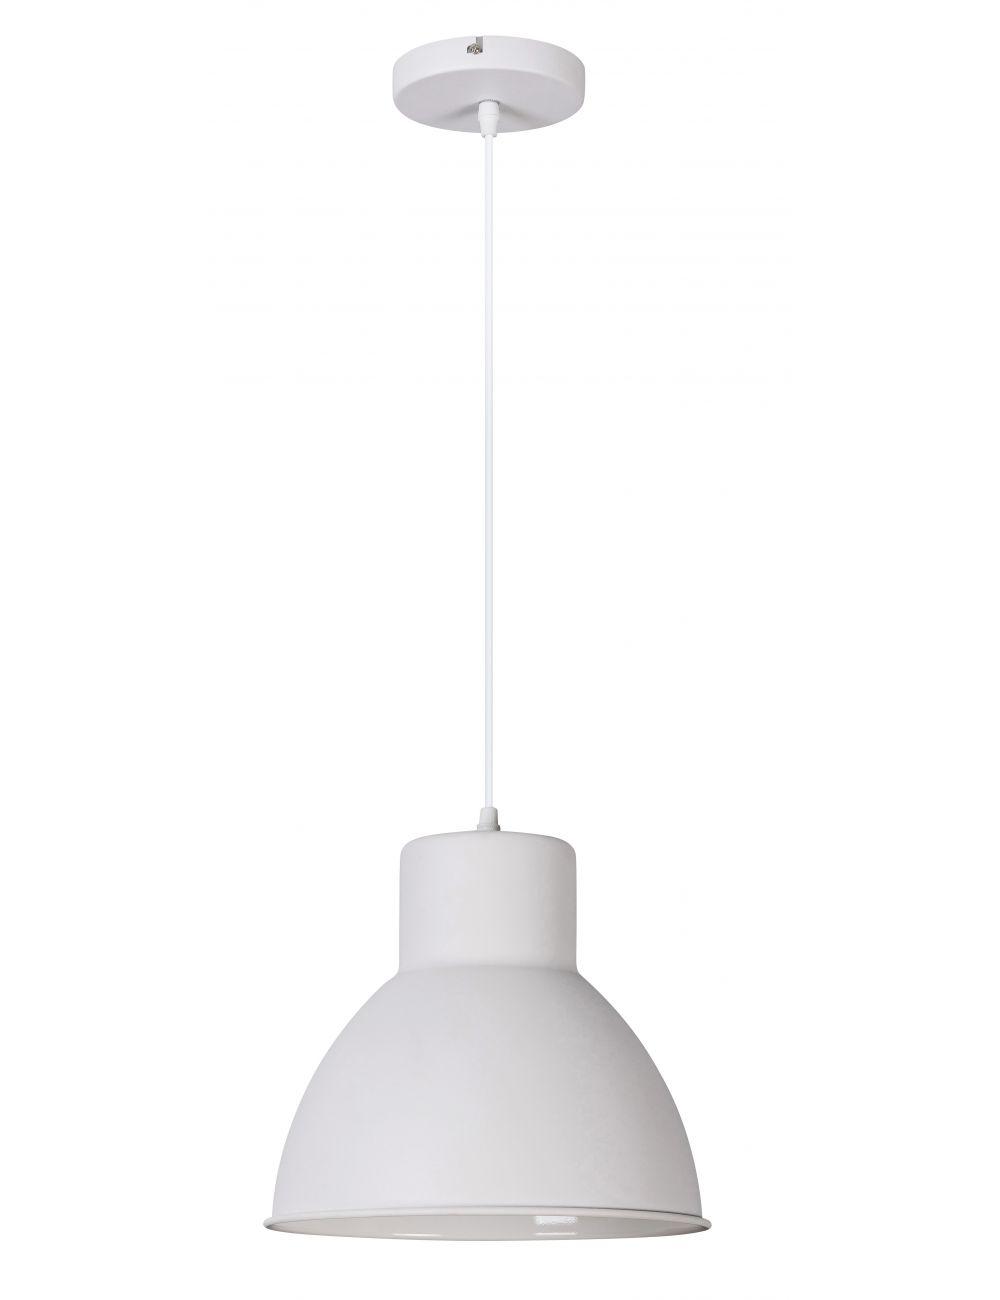 Lampa wisząca metalowa biała Derek loftowa Rabalux 2577